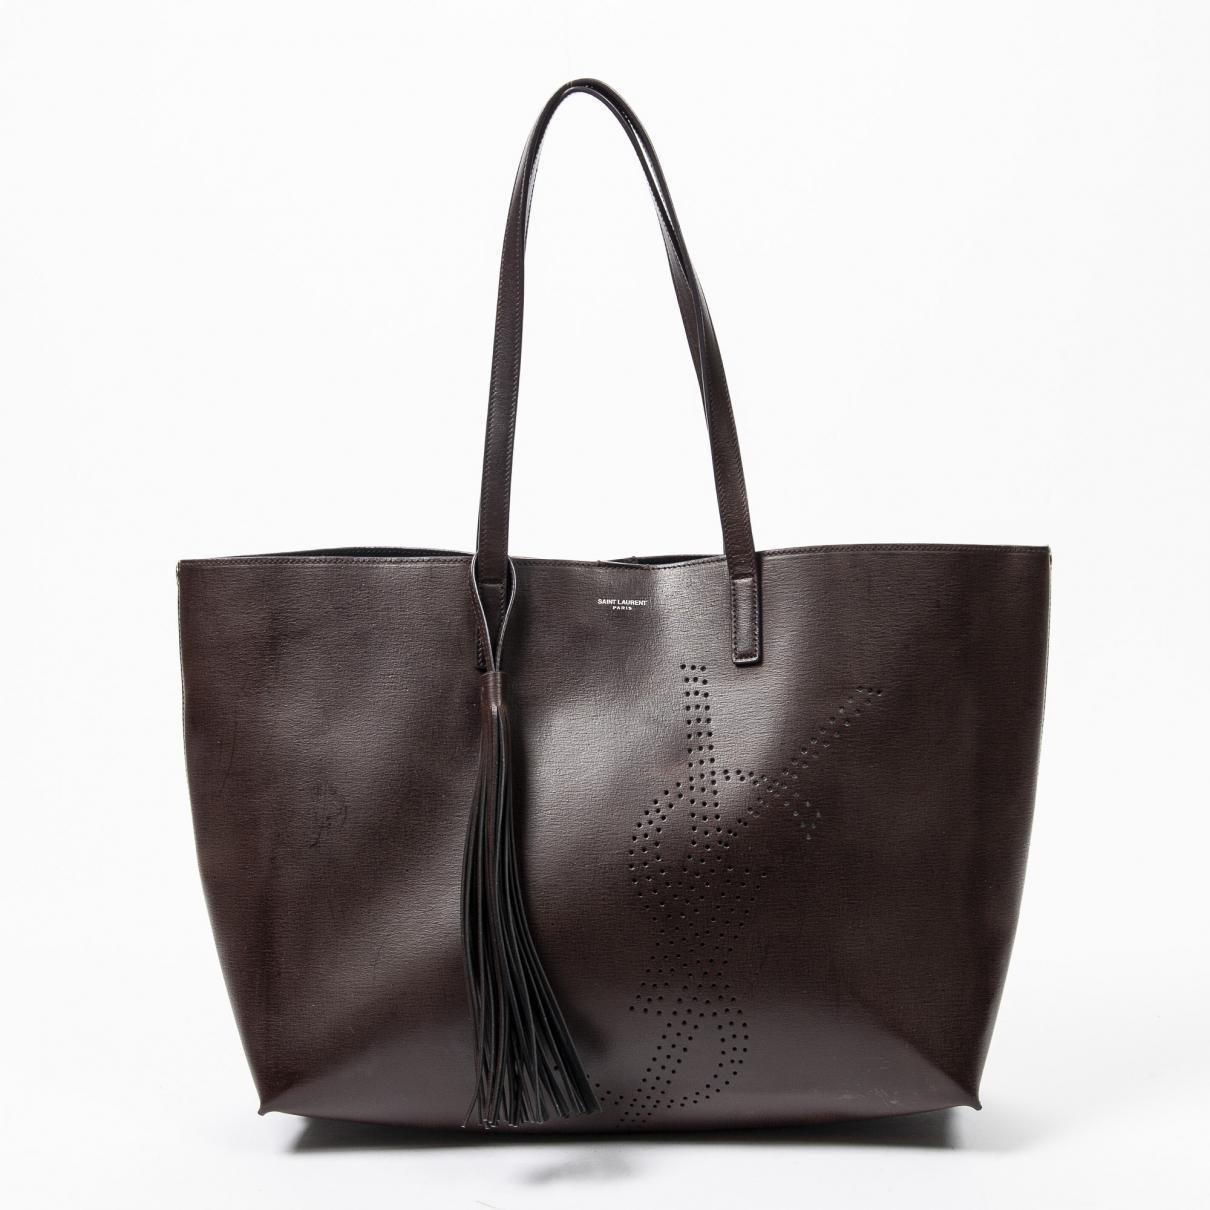 Yves Saint Laurent \N Brown Leather handbag for Women \N